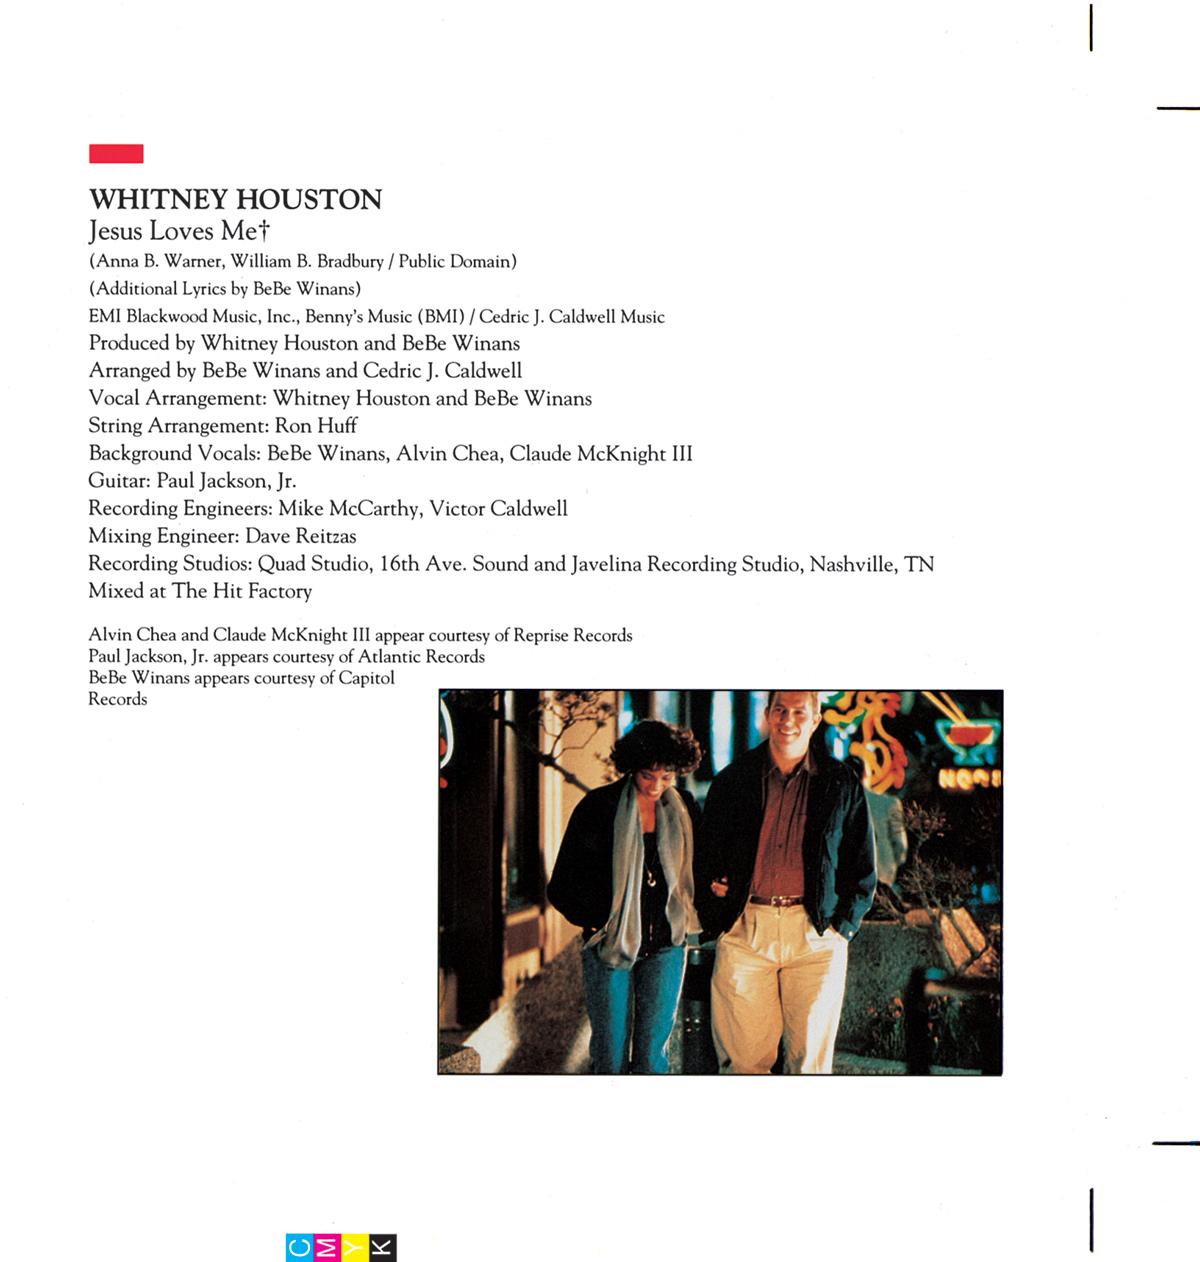 Whitney Houston - The Bodyguard soundtrack booklet page